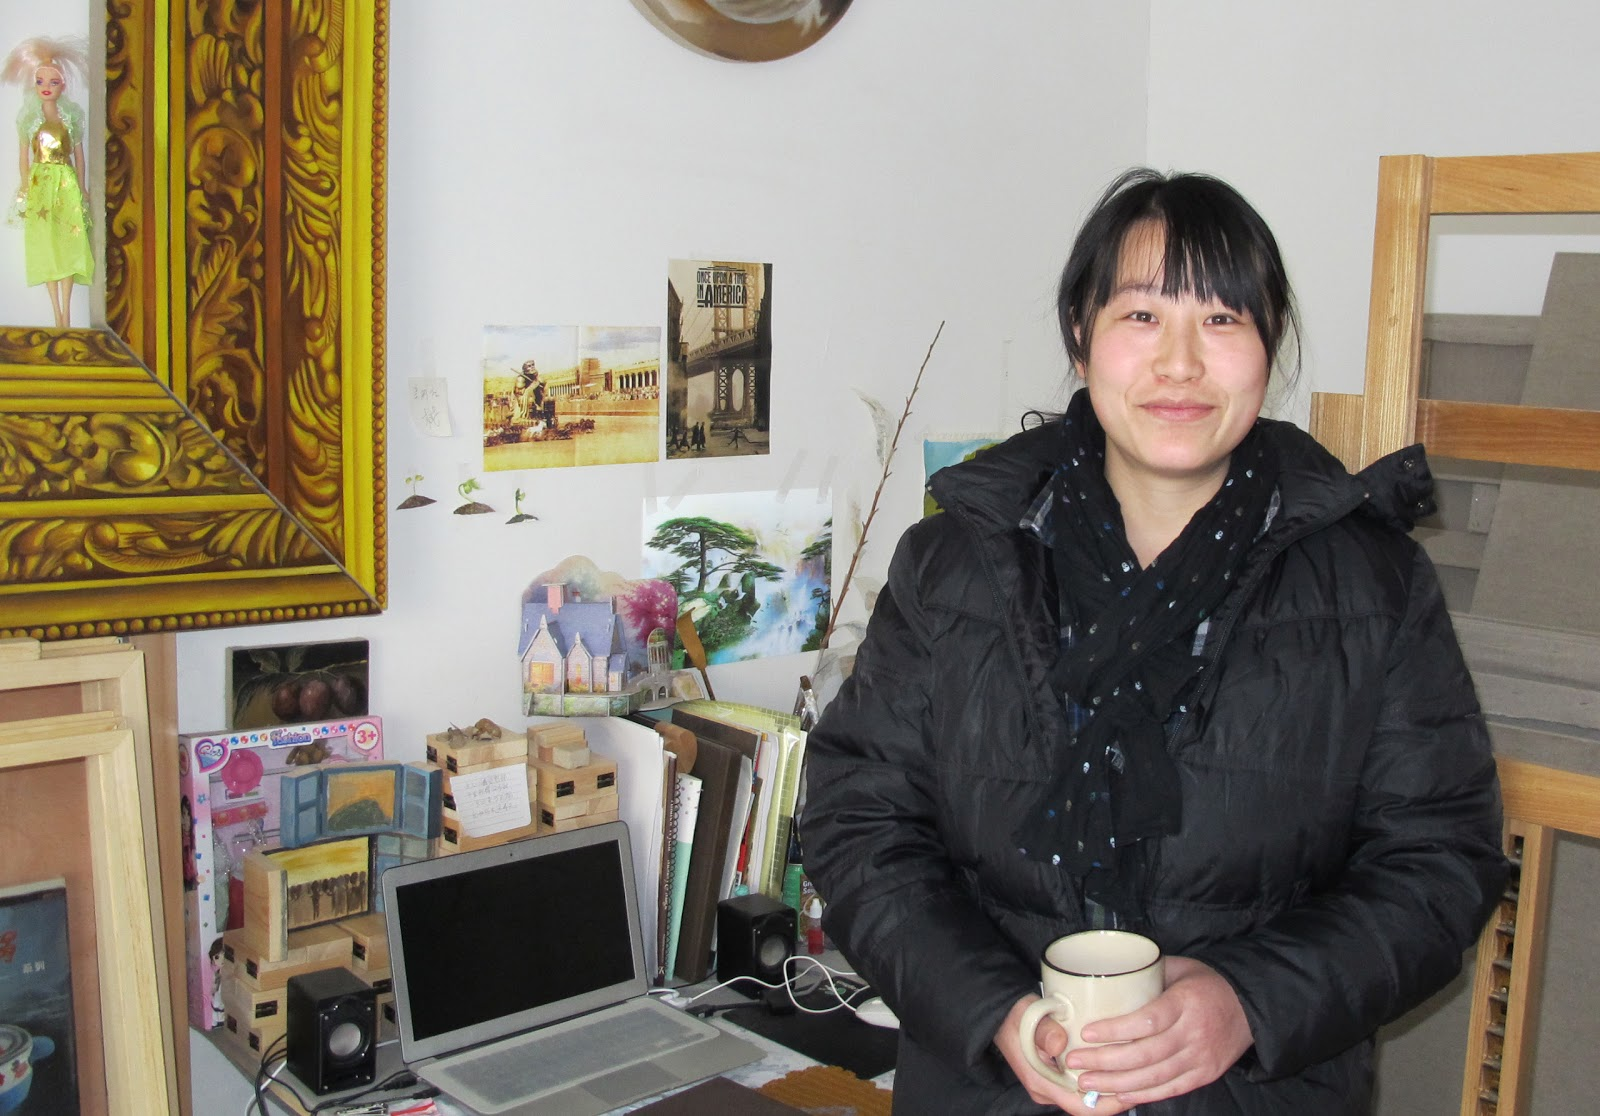 an art teacher in China: From Beijing to Shanghai ...